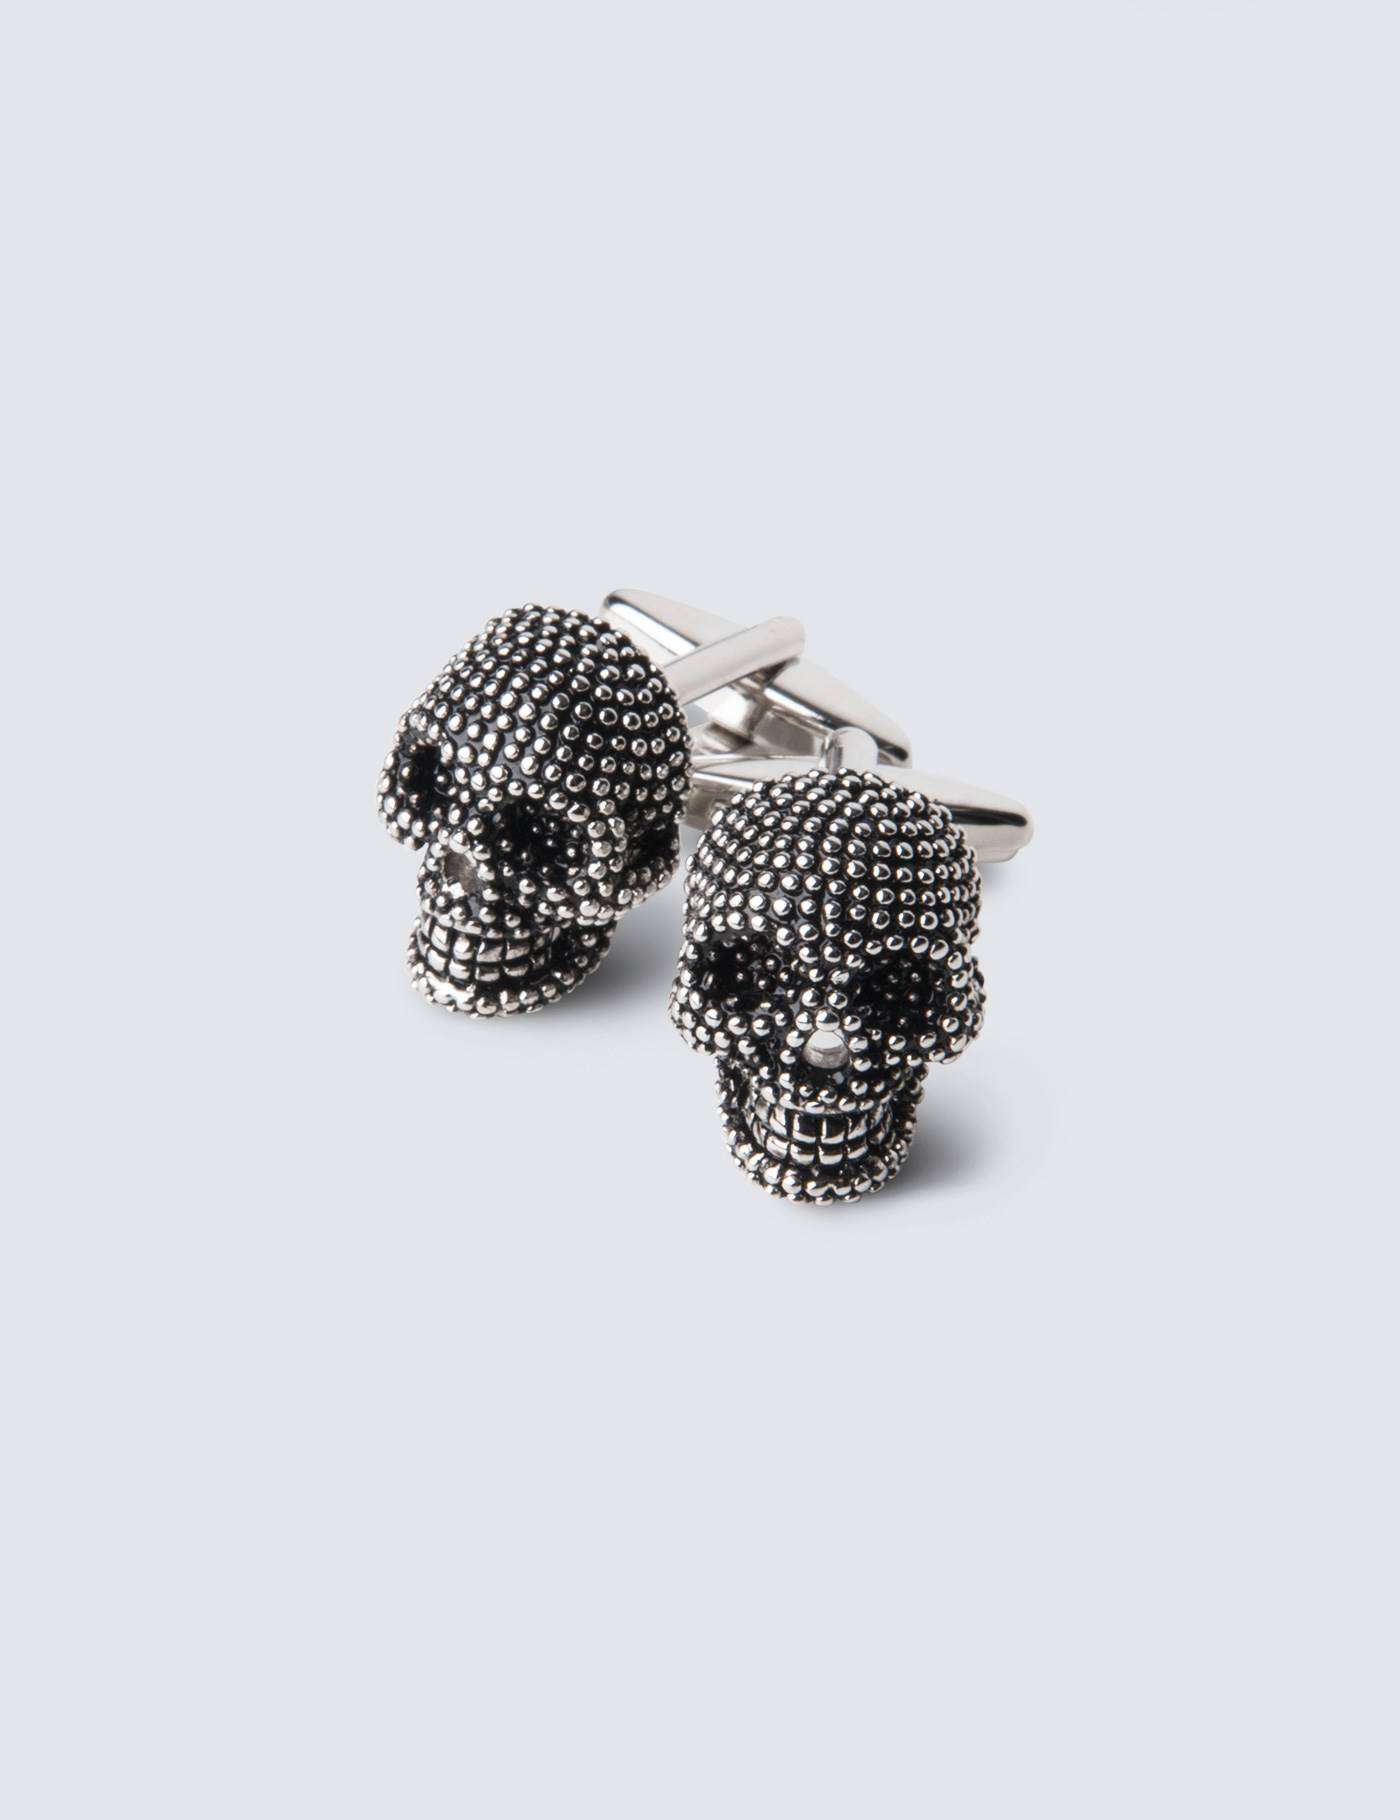 Hawes & Curtis Men's Skull Cufflink in Silver Hawes & Curtis